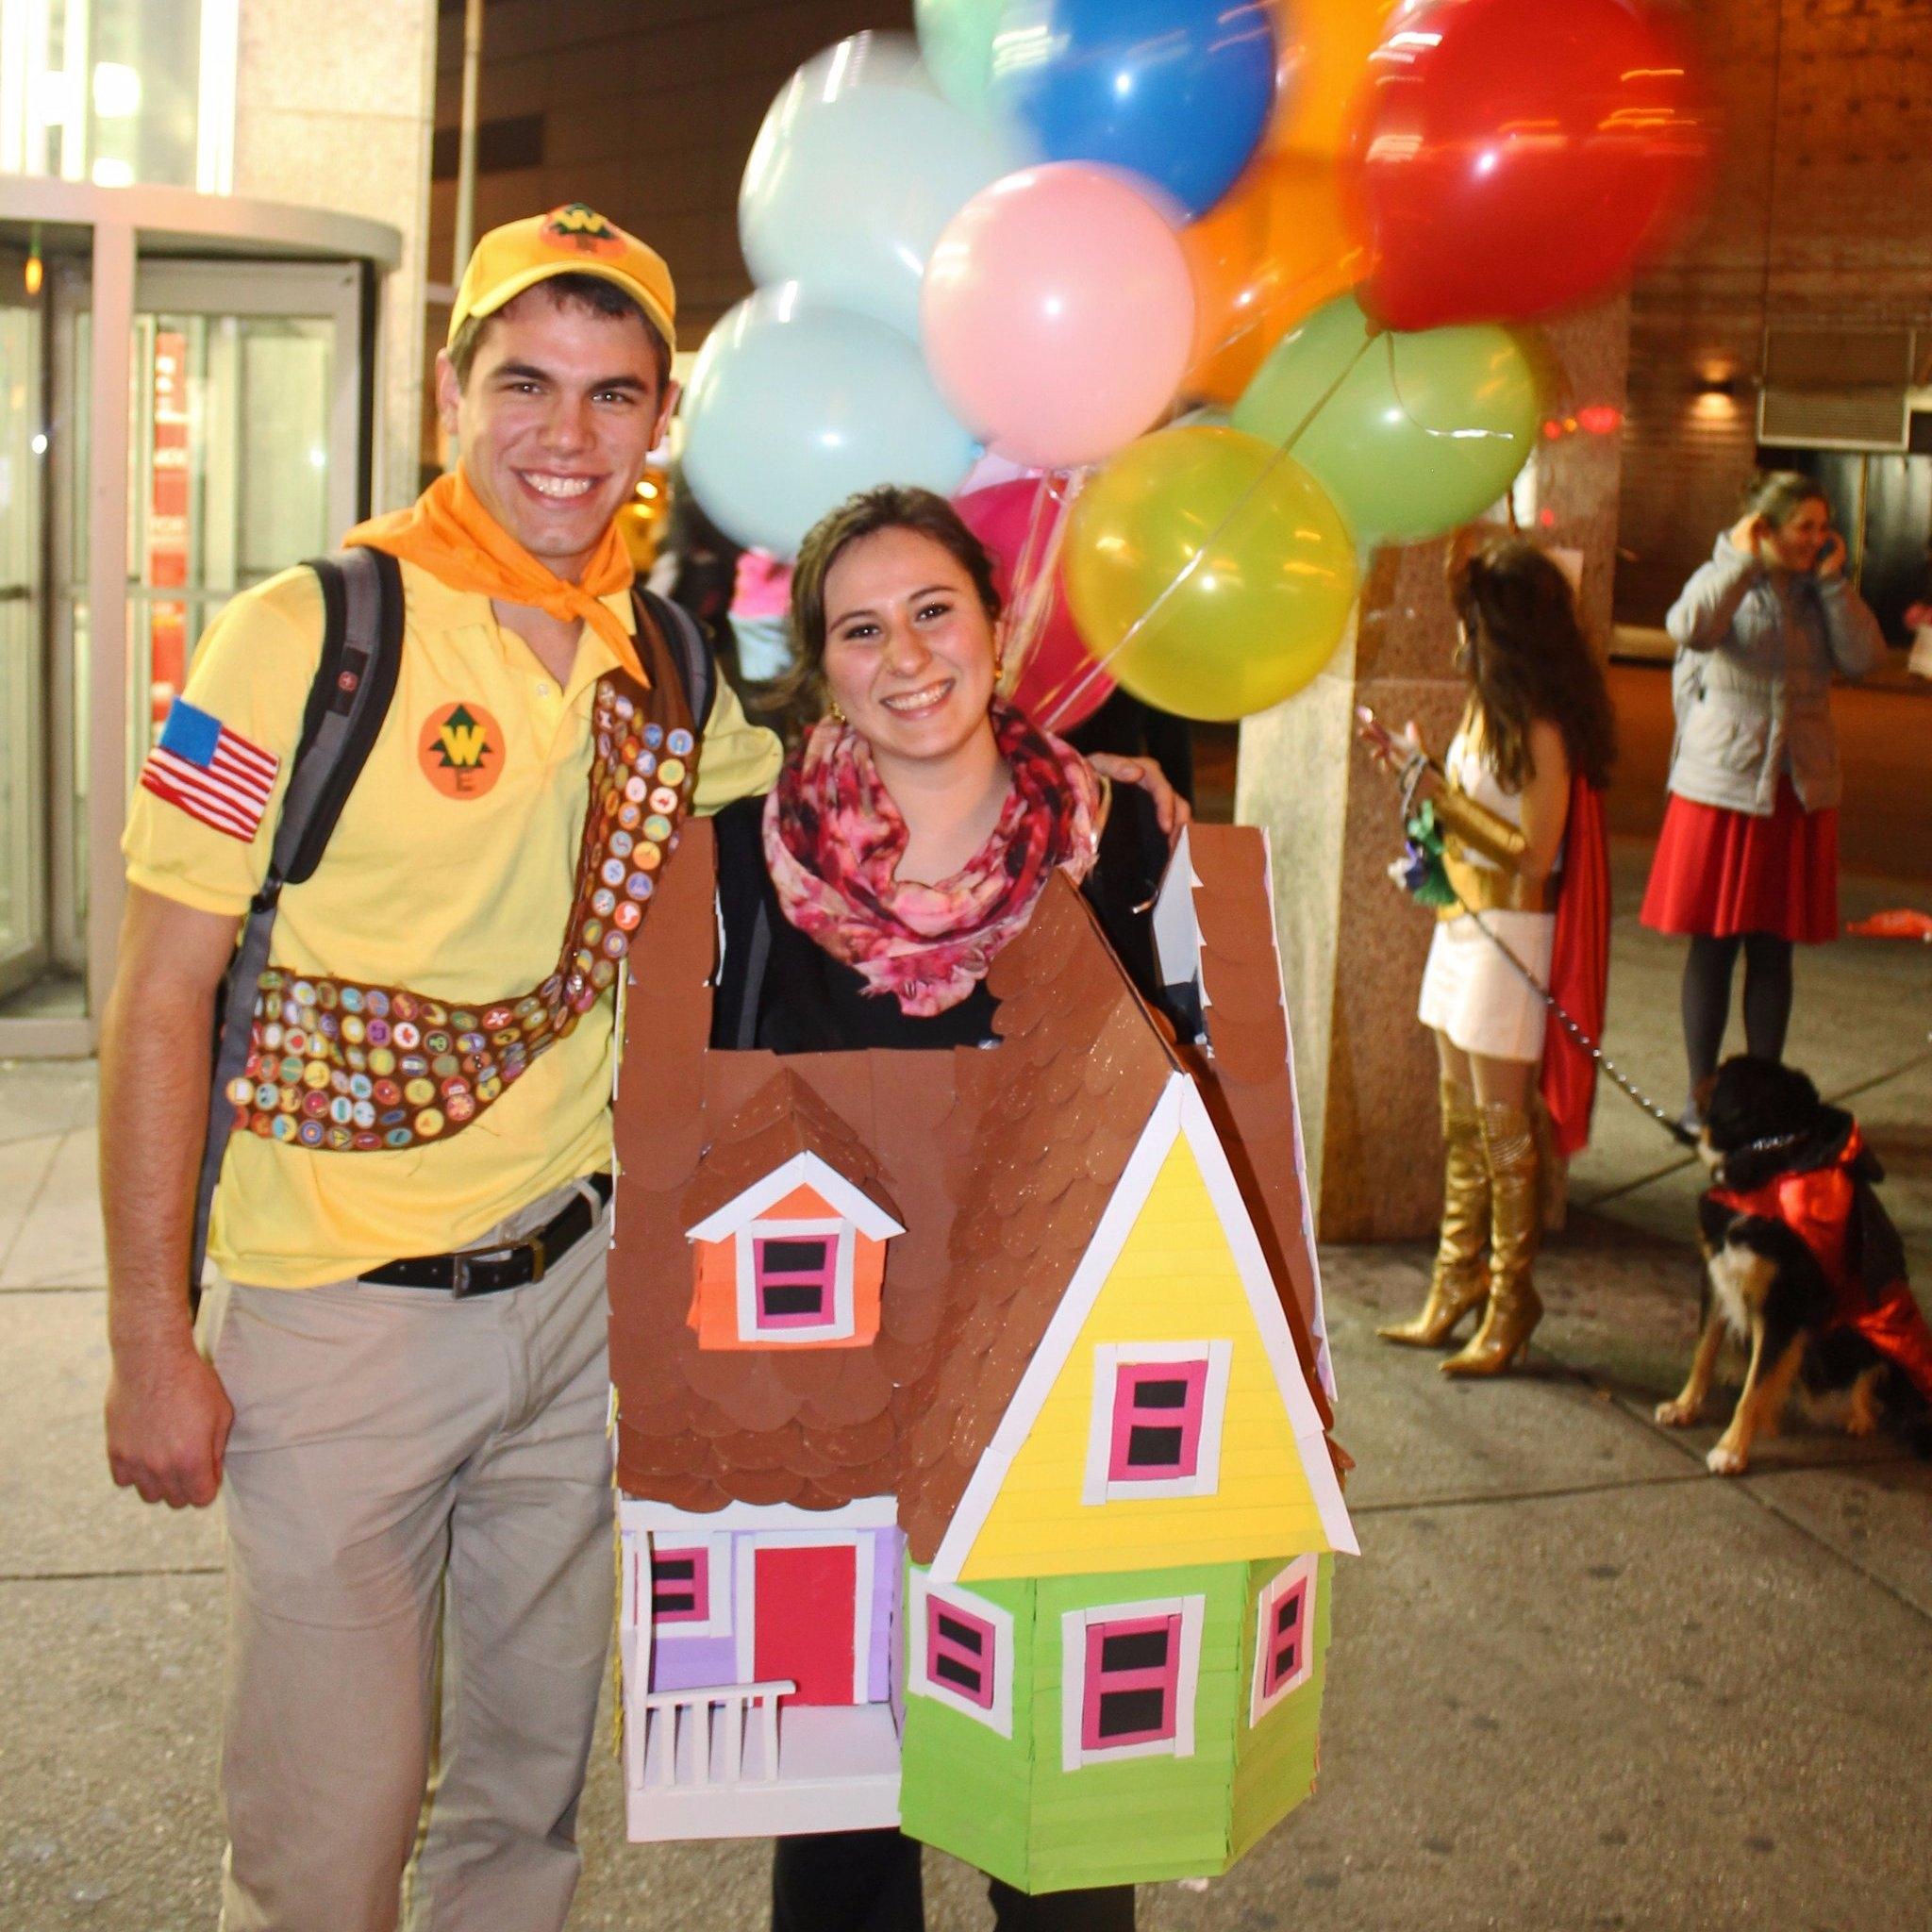 10 best cheap couples halloween costume ideas cheap diy couples halloween costumes popsugar smart living 28